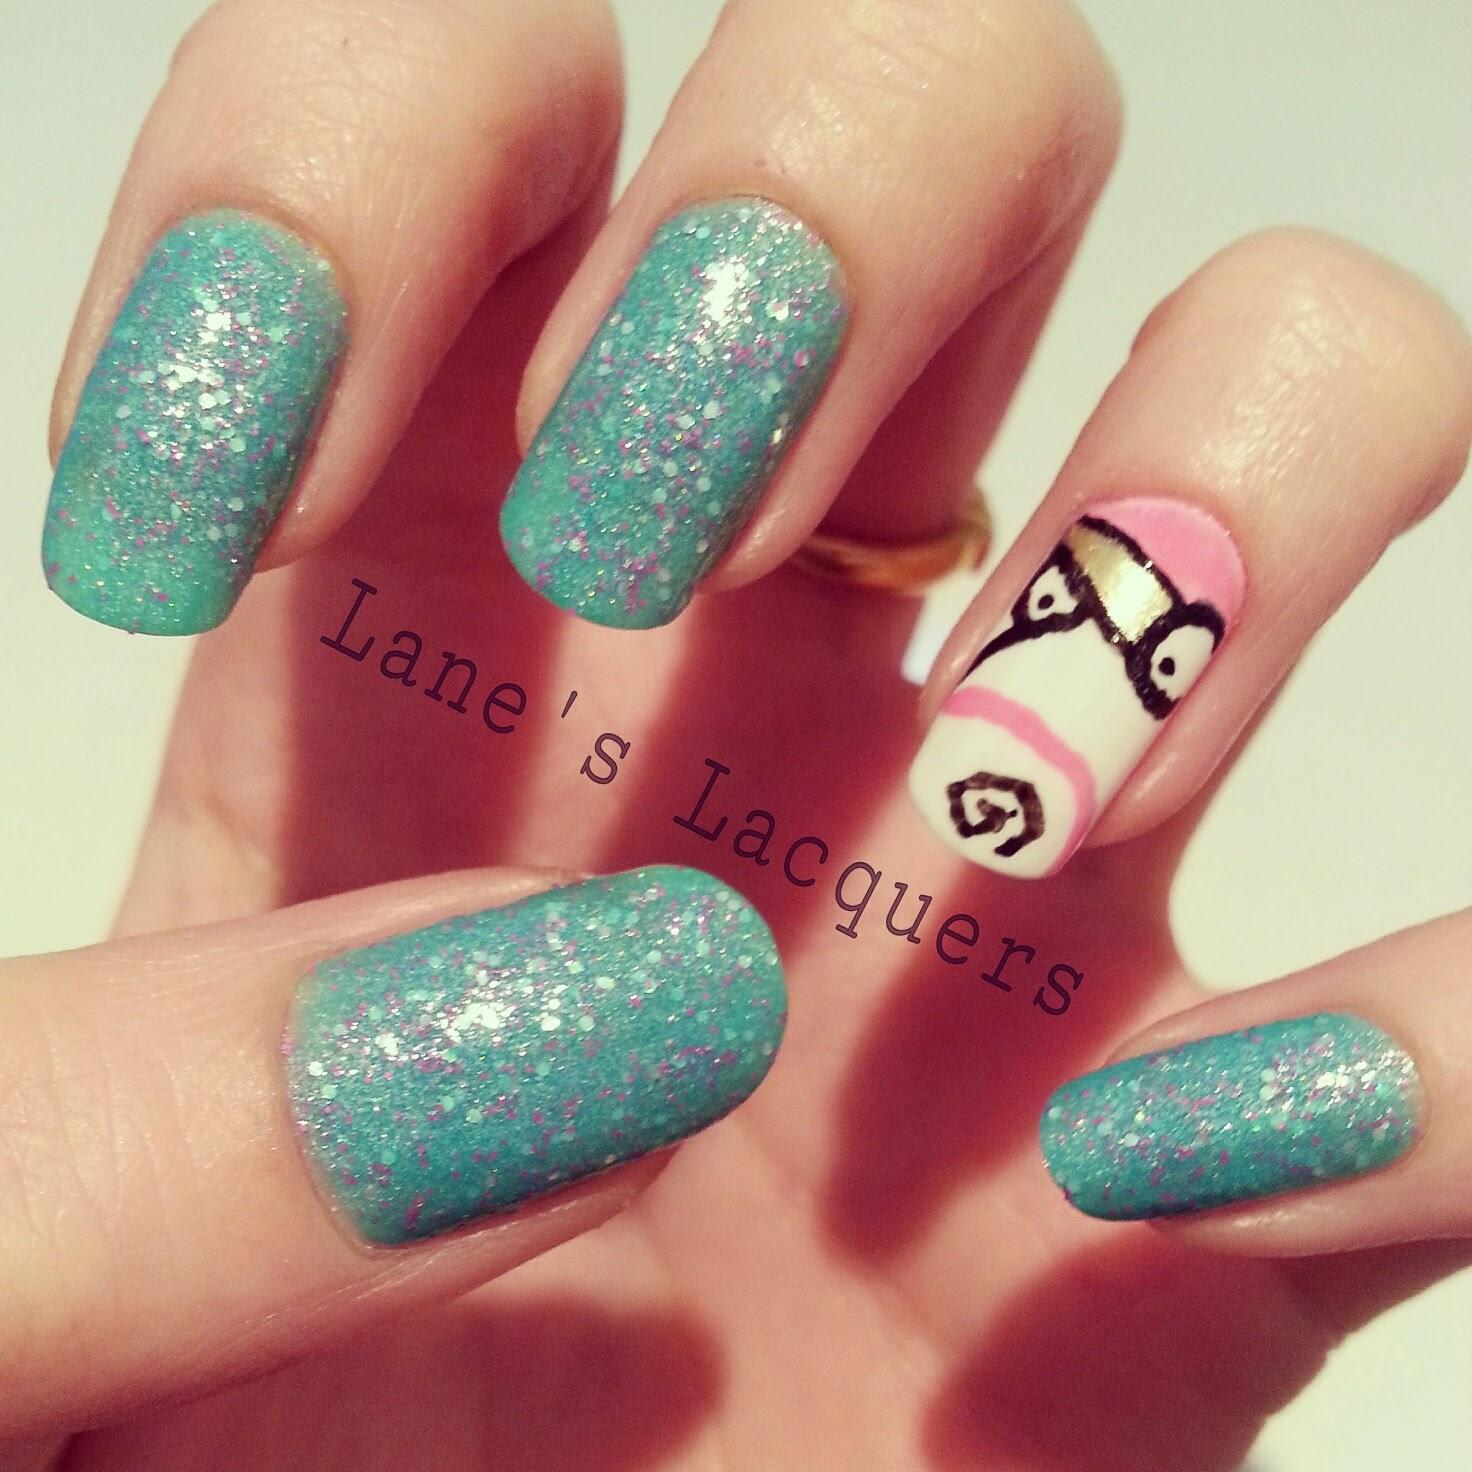 despicable me unicorn nails - photo #8